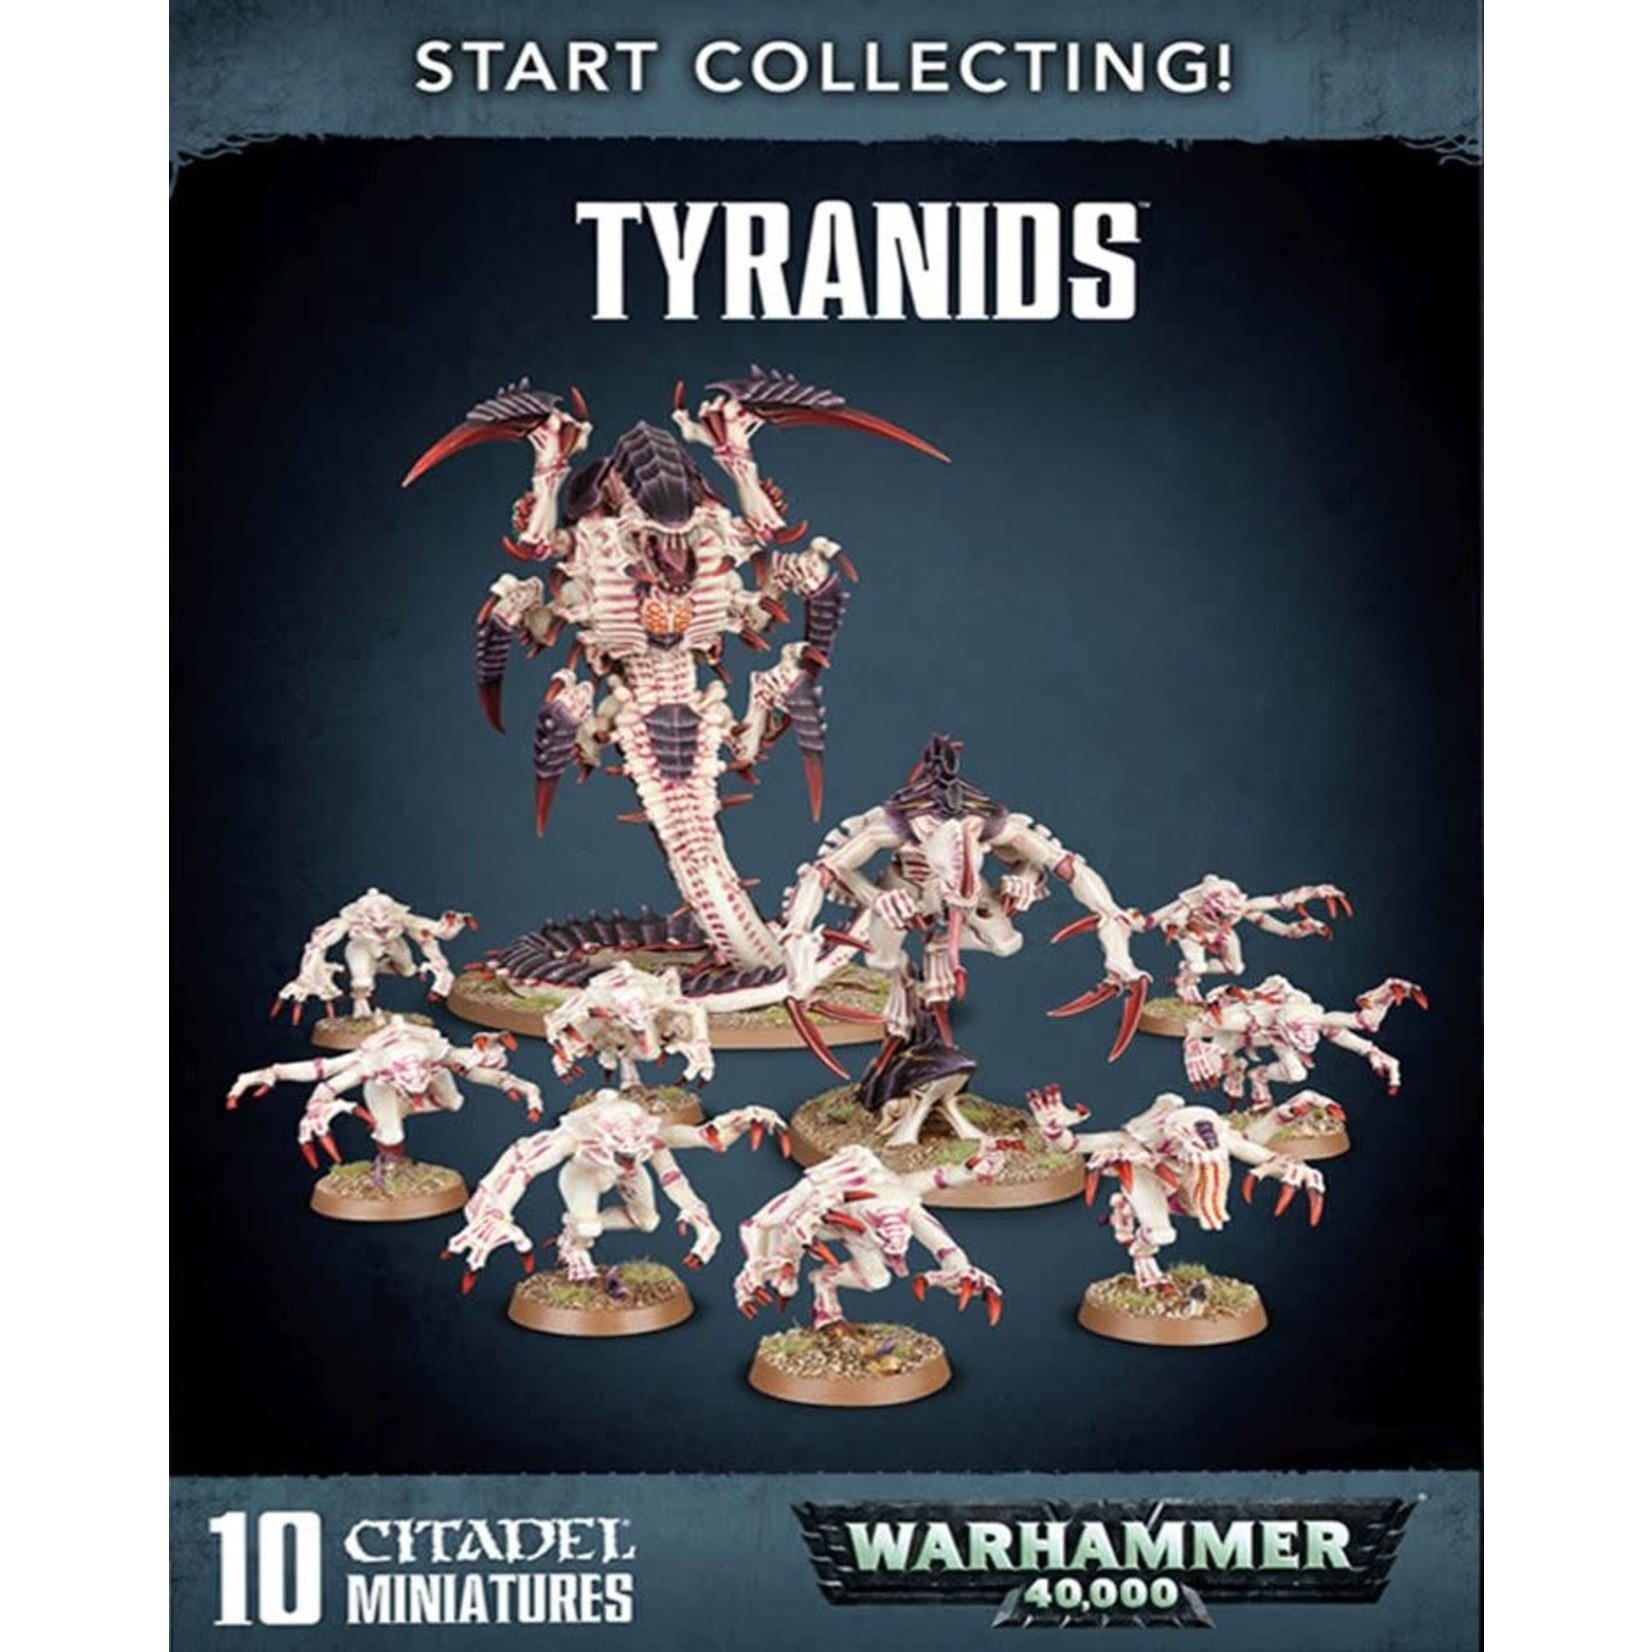 Games Workshop Warhammer 40k: Start Collecting! Tyranids (Trigon)